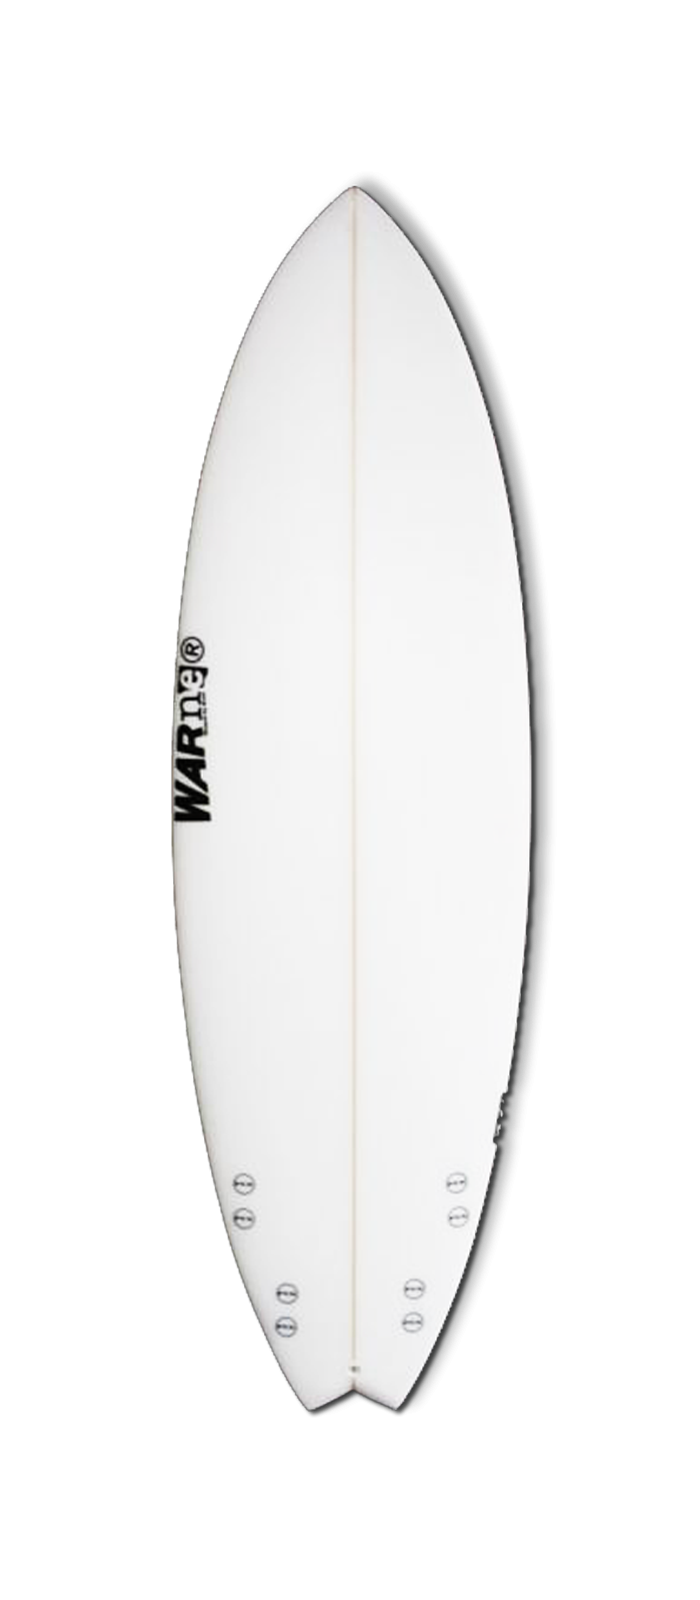 FTR surfboard model